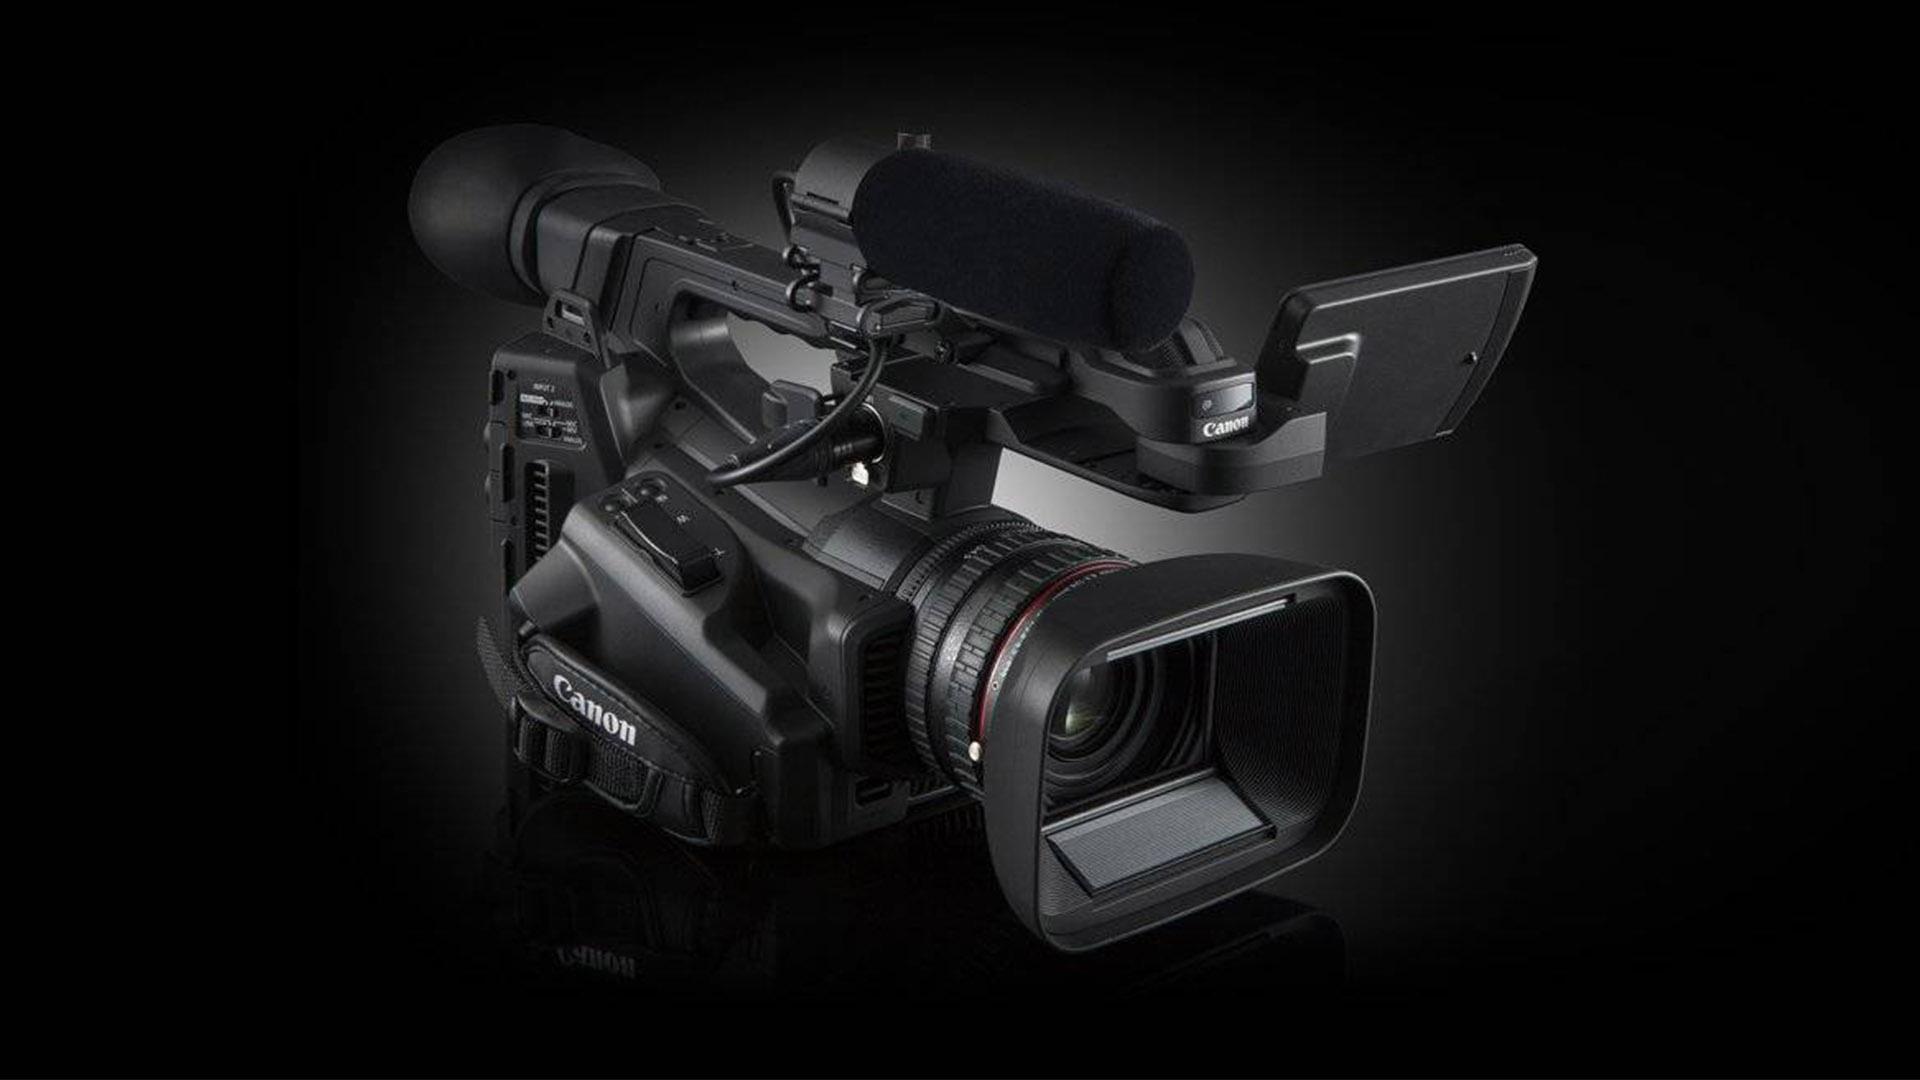 Conheça a nova Canon XF705